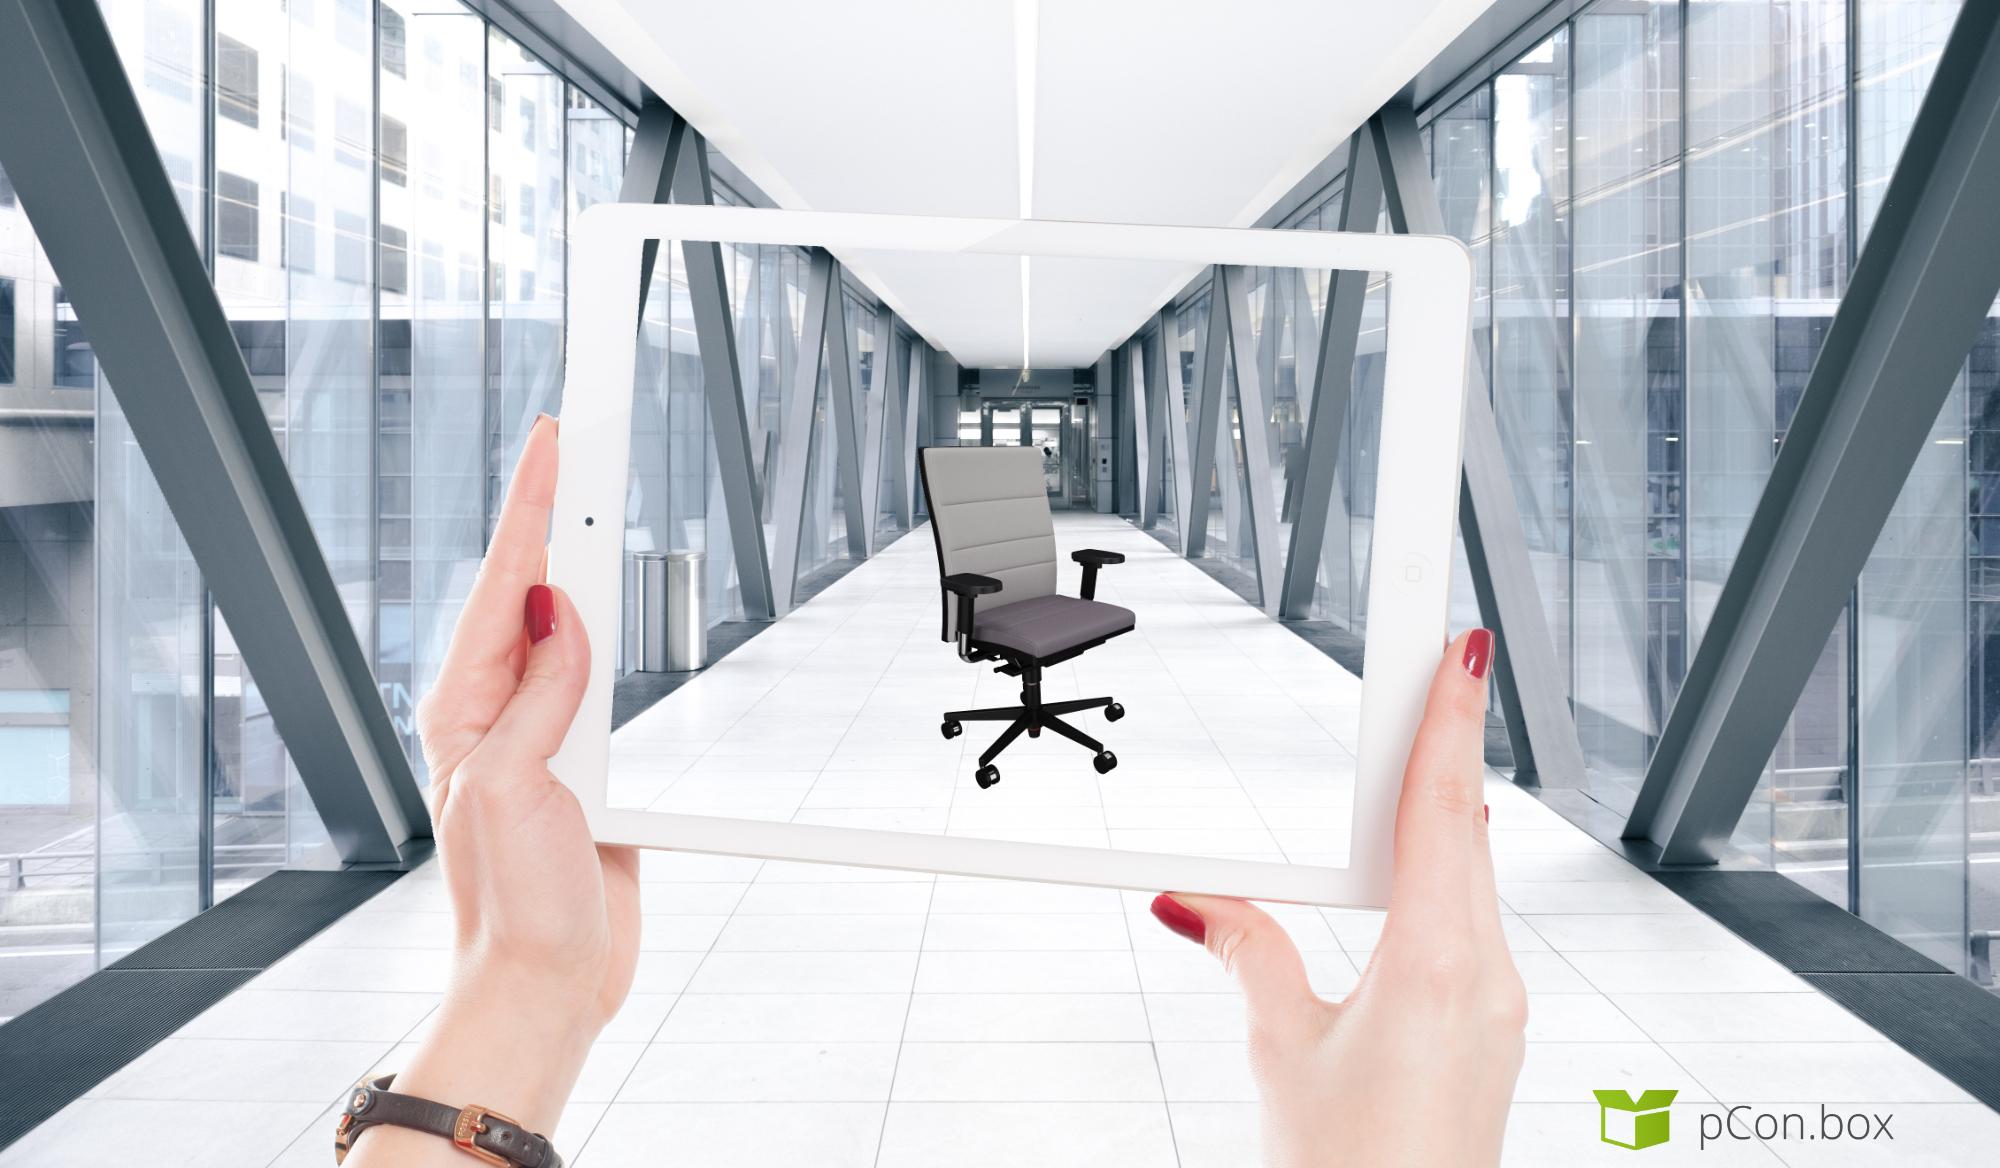 Appsolut cool! Neue pCon.box mit AR schon erkundet? pCon.box Augmented Reality App